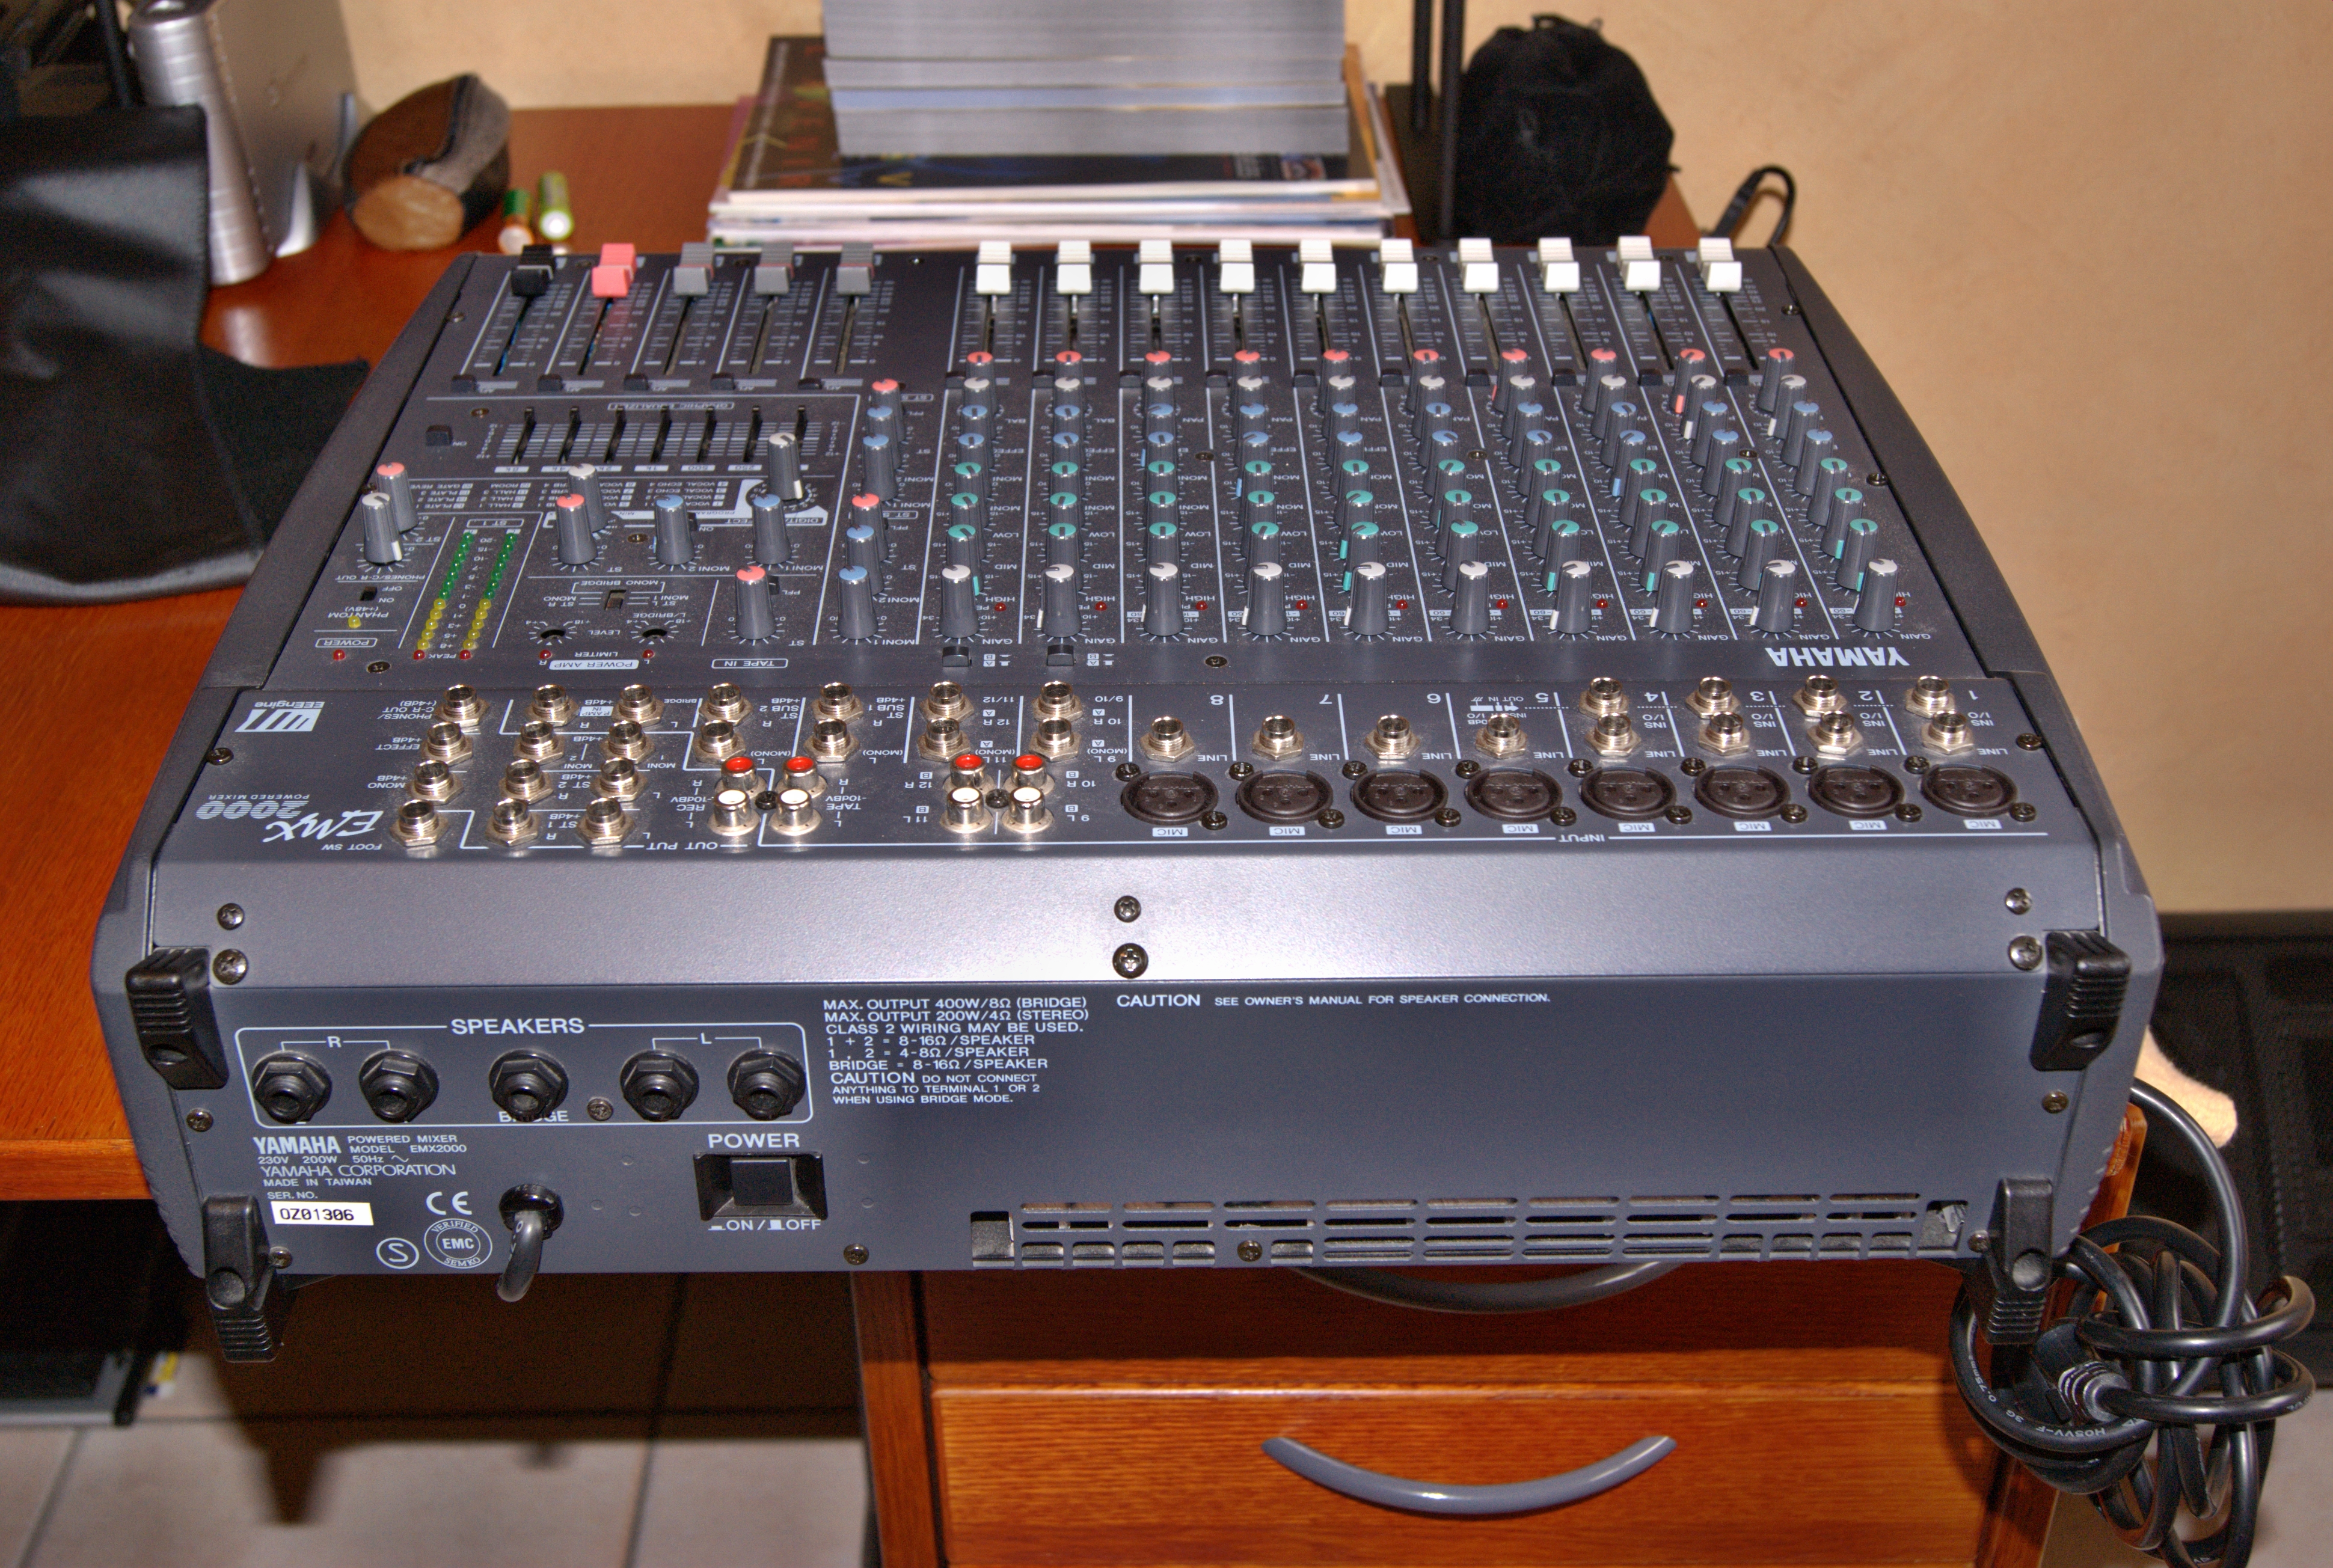 Photo yamaha emx2000 12 yamaha emx2000 12 28621 284480 audiofanzine - Console de mixage amplifiee ...